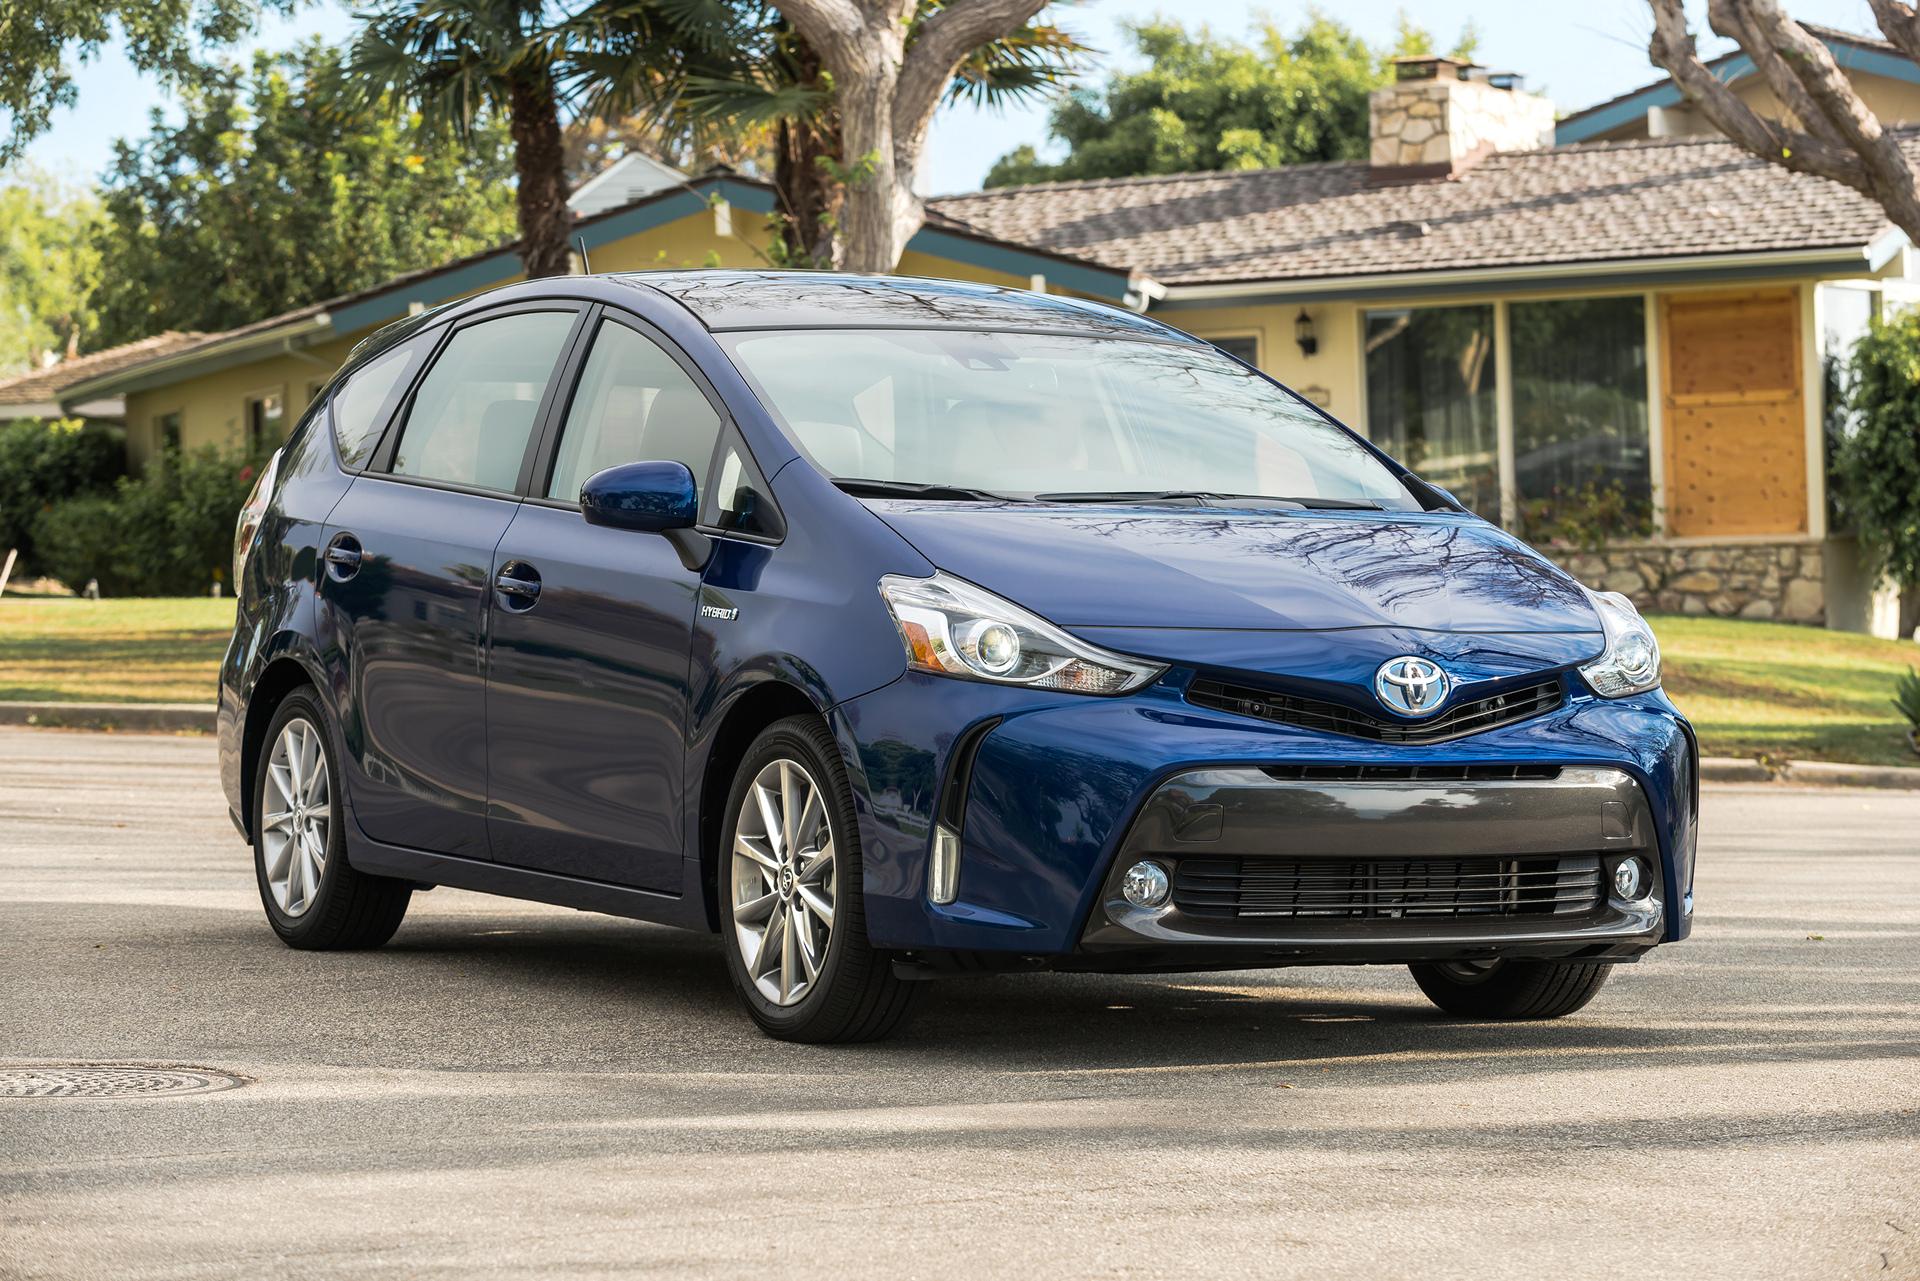 2017 Toyota Prius v © Toyota Motor Corporation